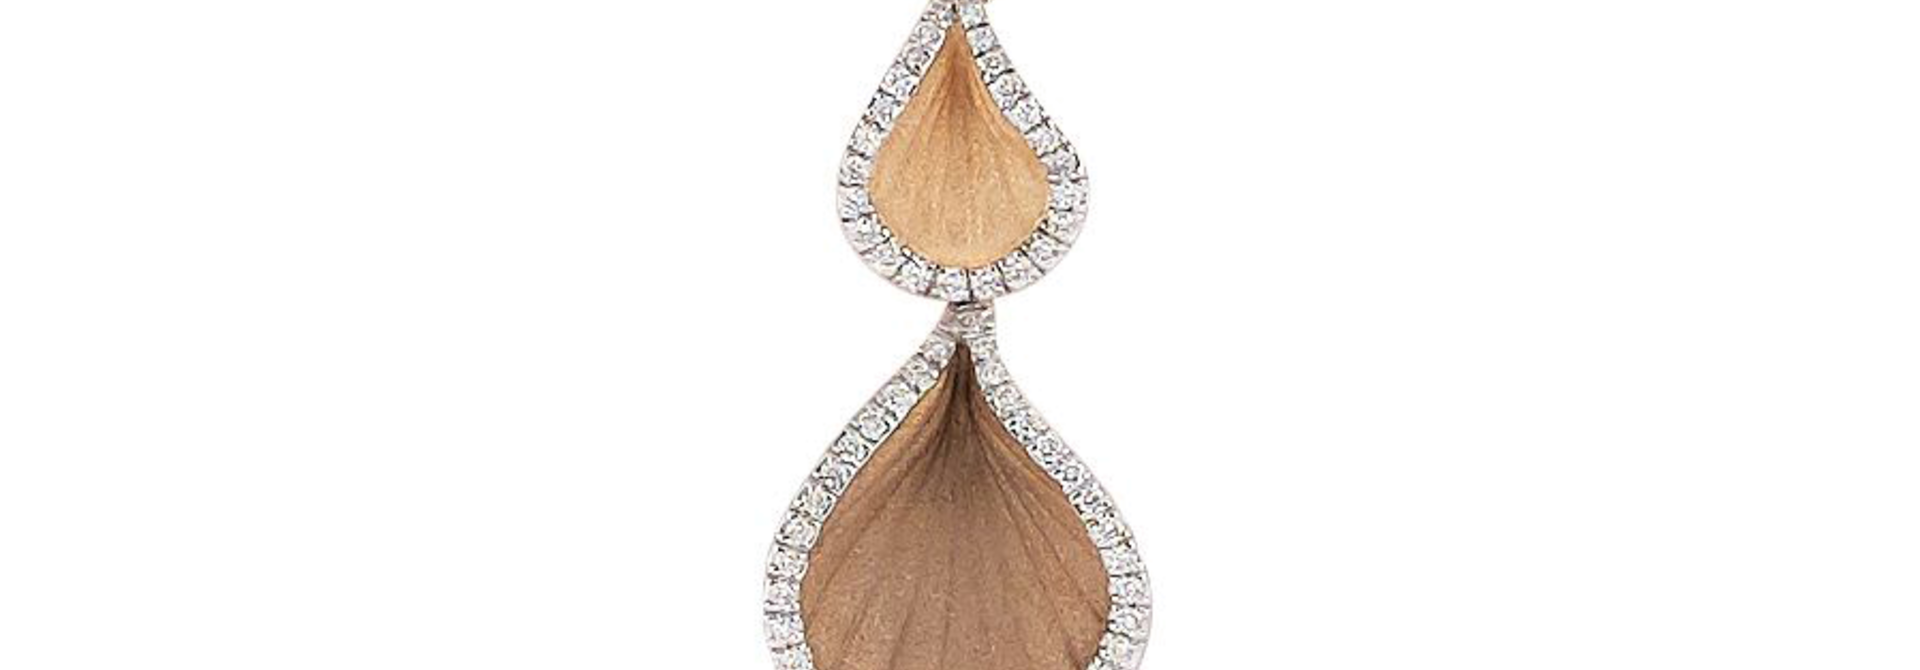 Goccia Collection Pendant,18Kt Orange Apricot Gold with Diamonds